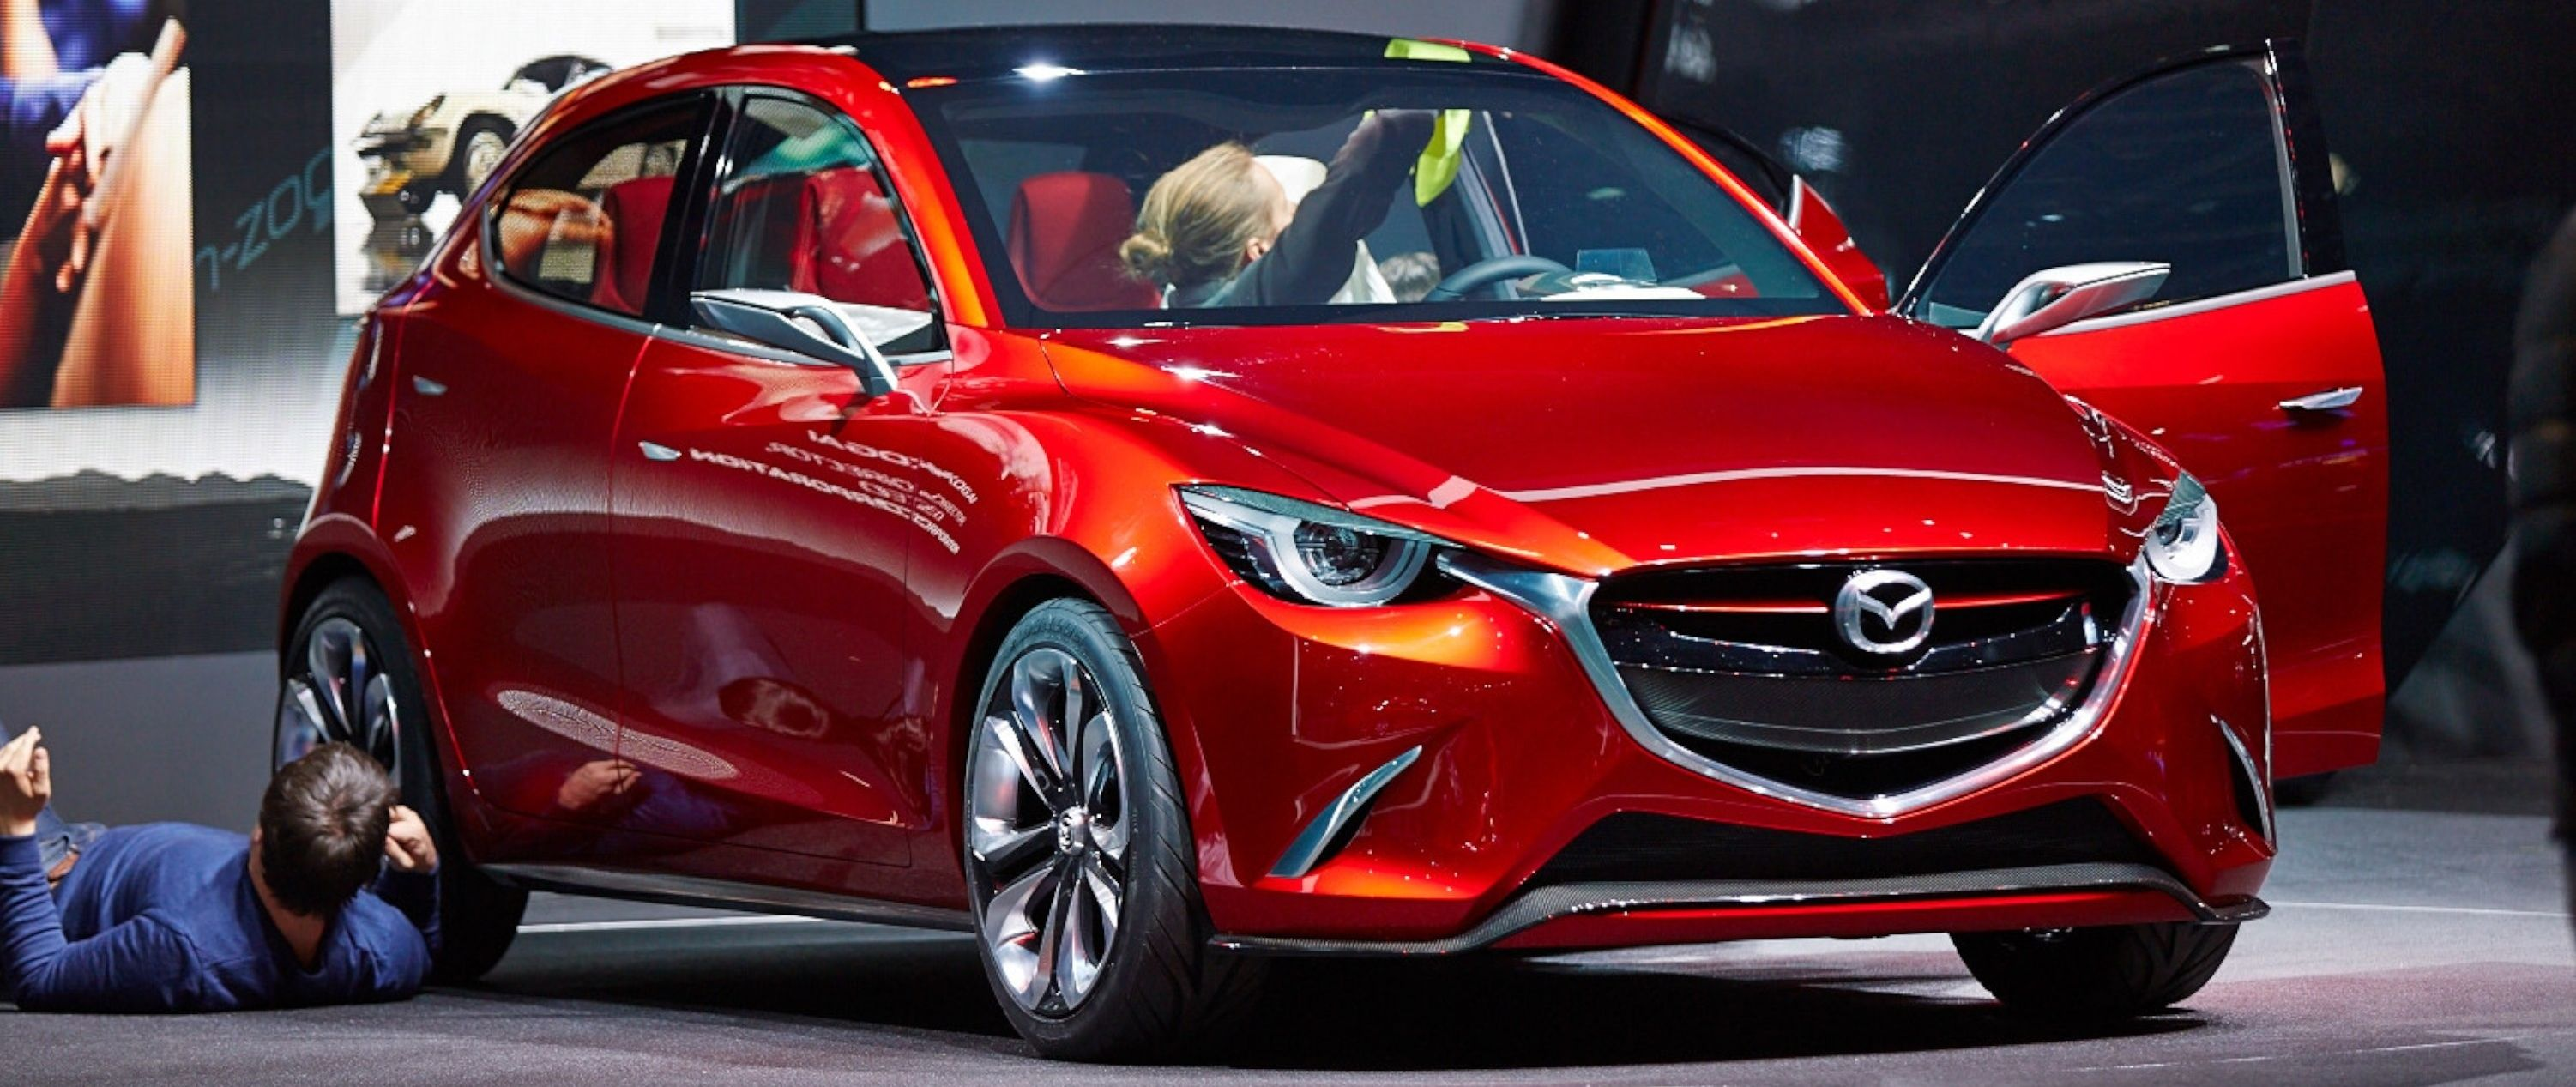 Daftar Harga All New Mazda 2 Indonesia Resmi Dirilis Mazda Indonesia